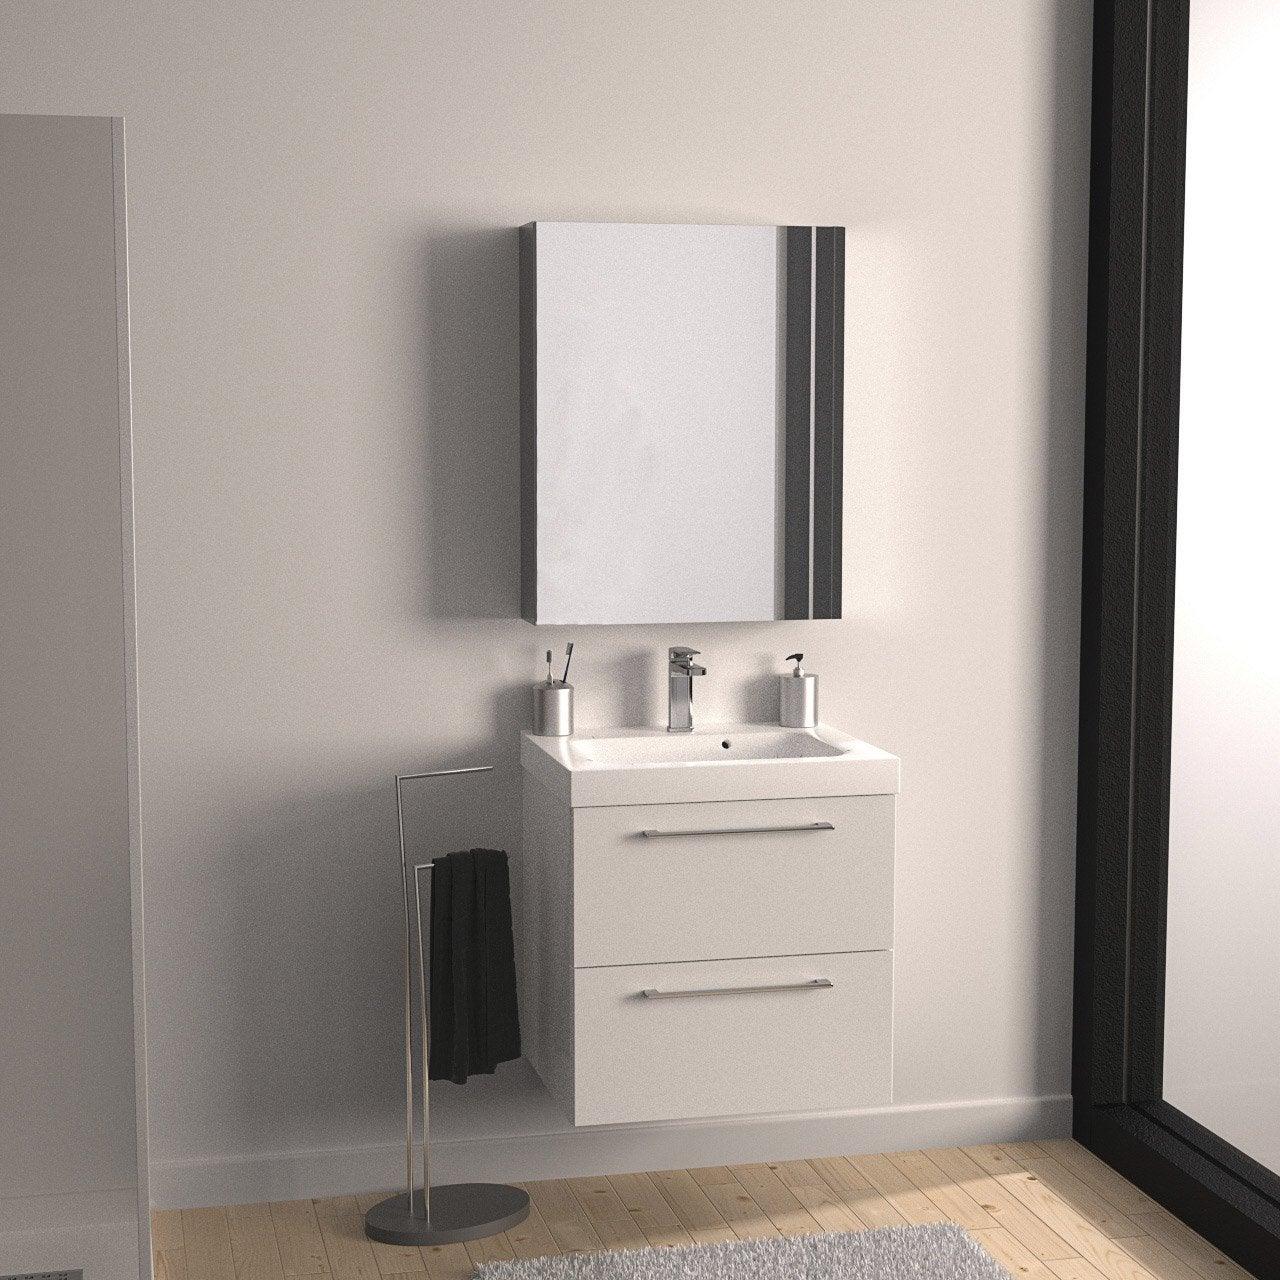 Meuble de salle de bains remix blanc blanc n 0 61x48 5 cm for Porte de meuble salle de bain leroy merlin